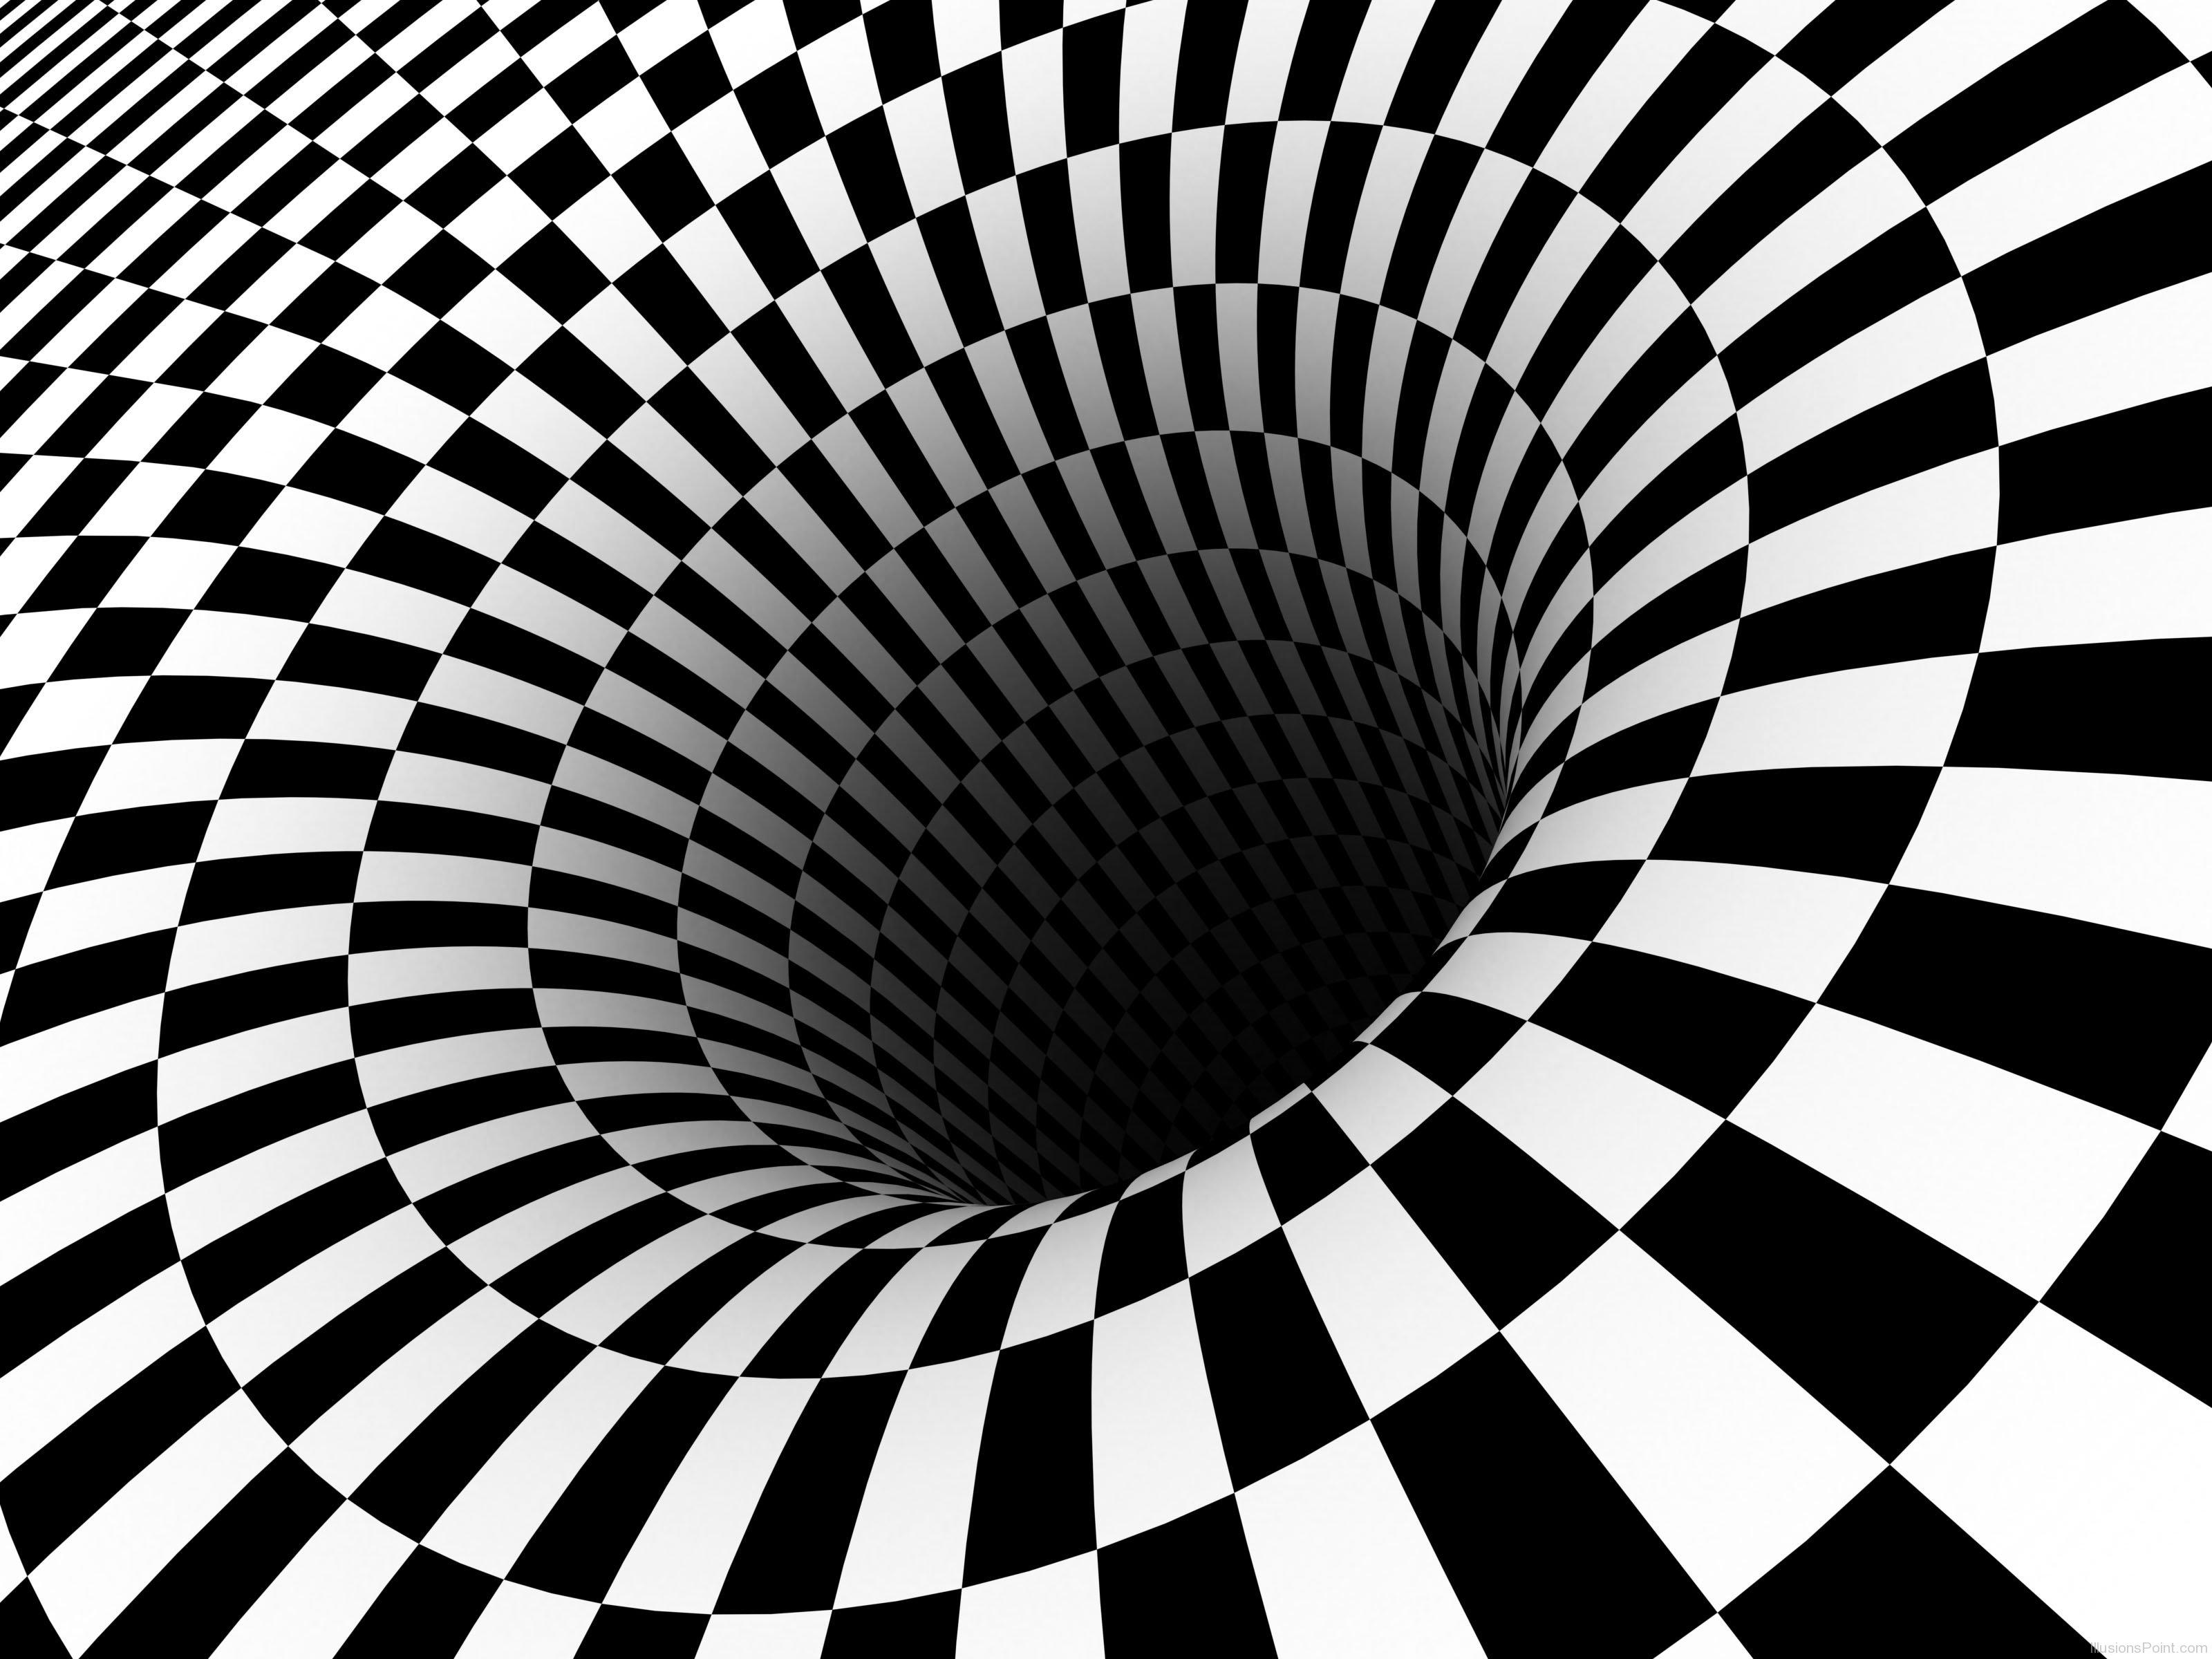 3200x2400 Optical Illusion